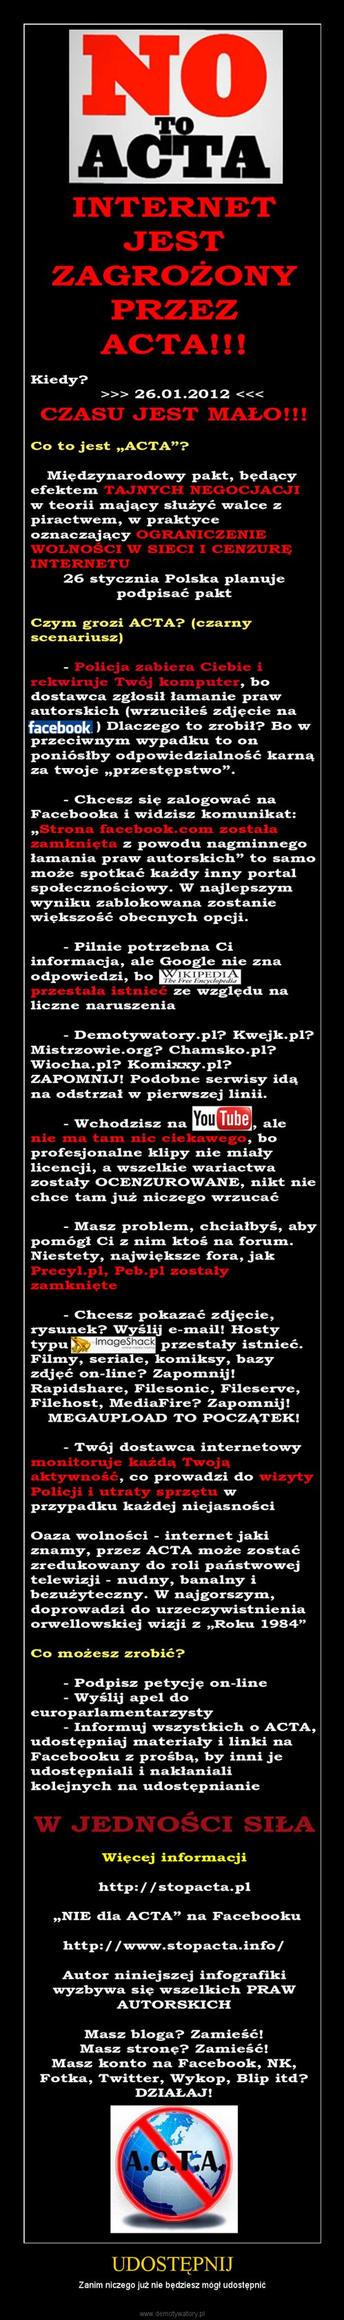 SAY NO FOR ACTA ! by xMidziak